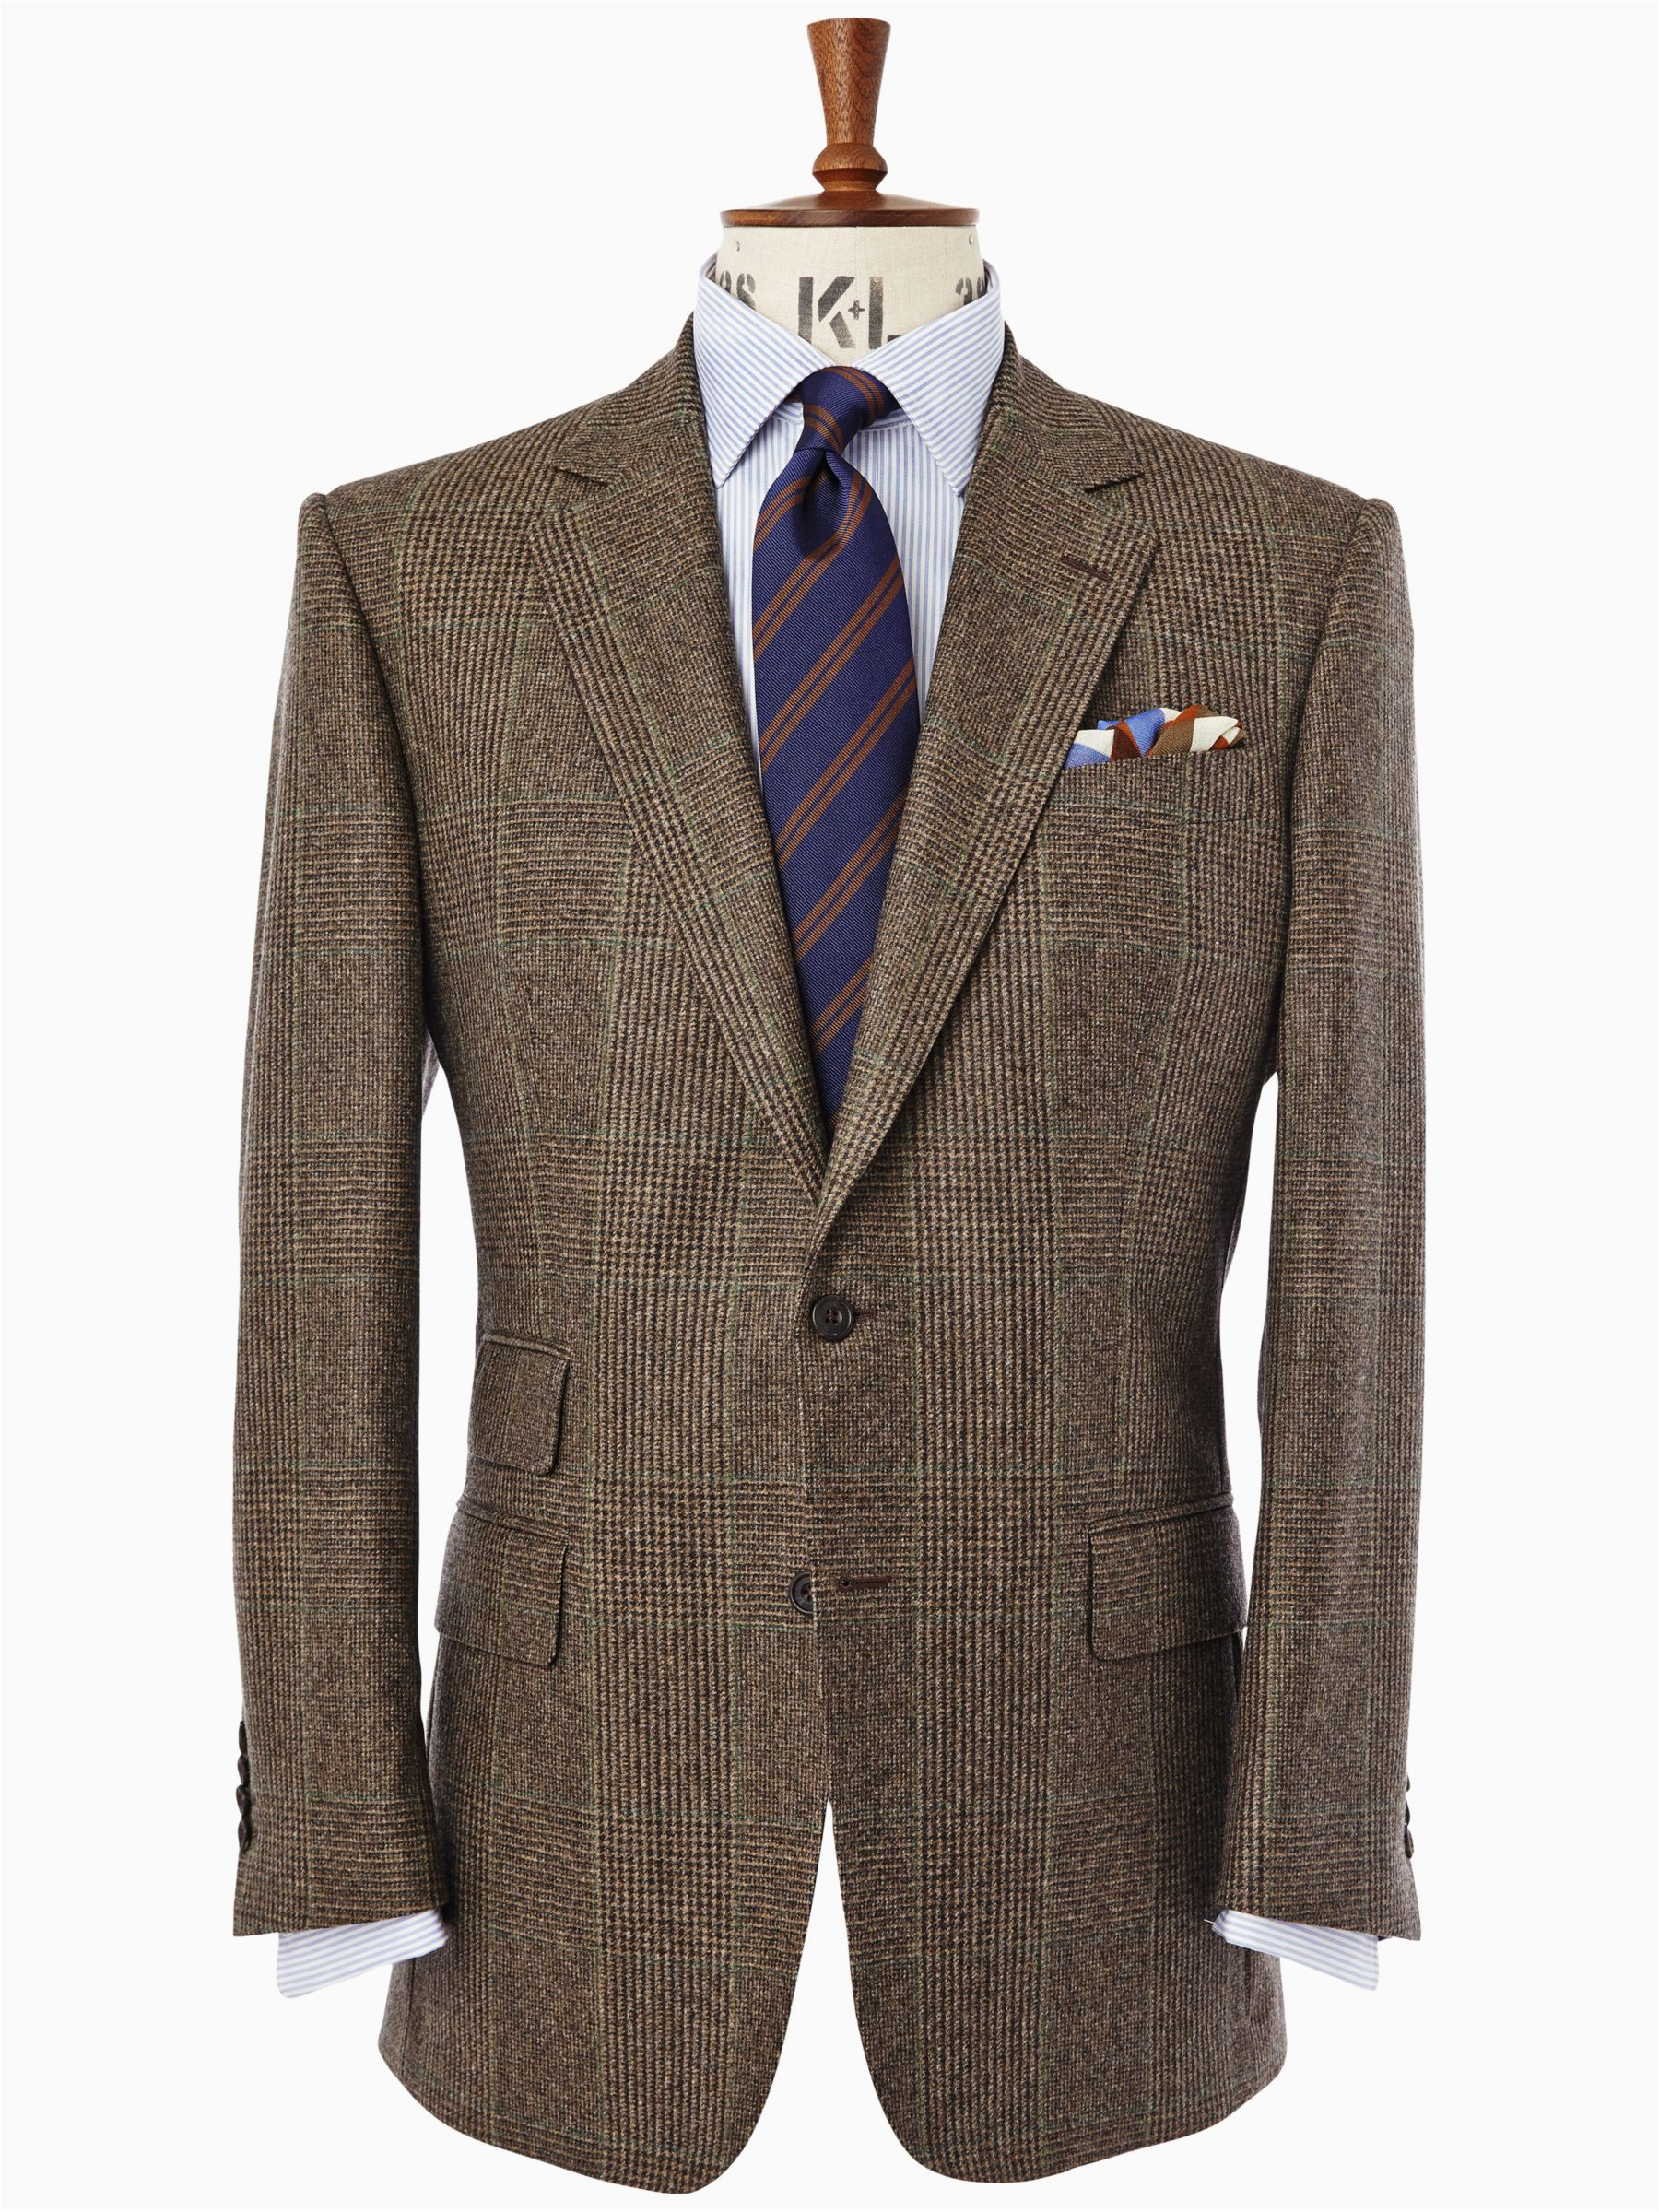 Savile Row Bath Rugs Chester Barrie Savile Row Classic Flannel Glen Check Jacket